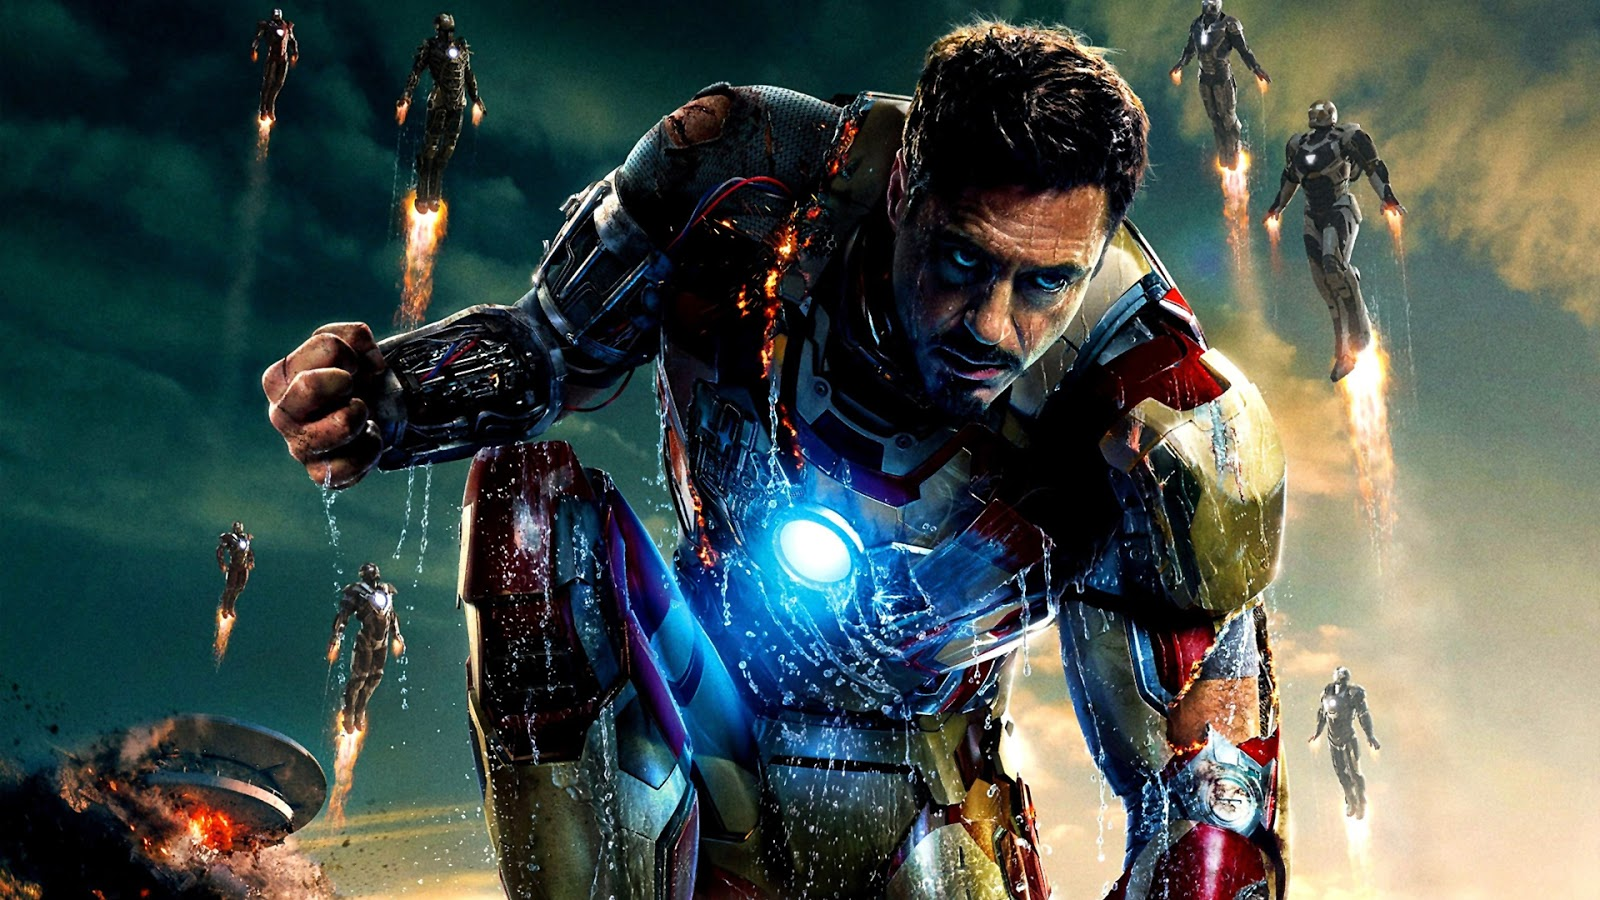 Iron Man Wallpapers Hd Free Download: Iron Man HD Wallpapers 1080p